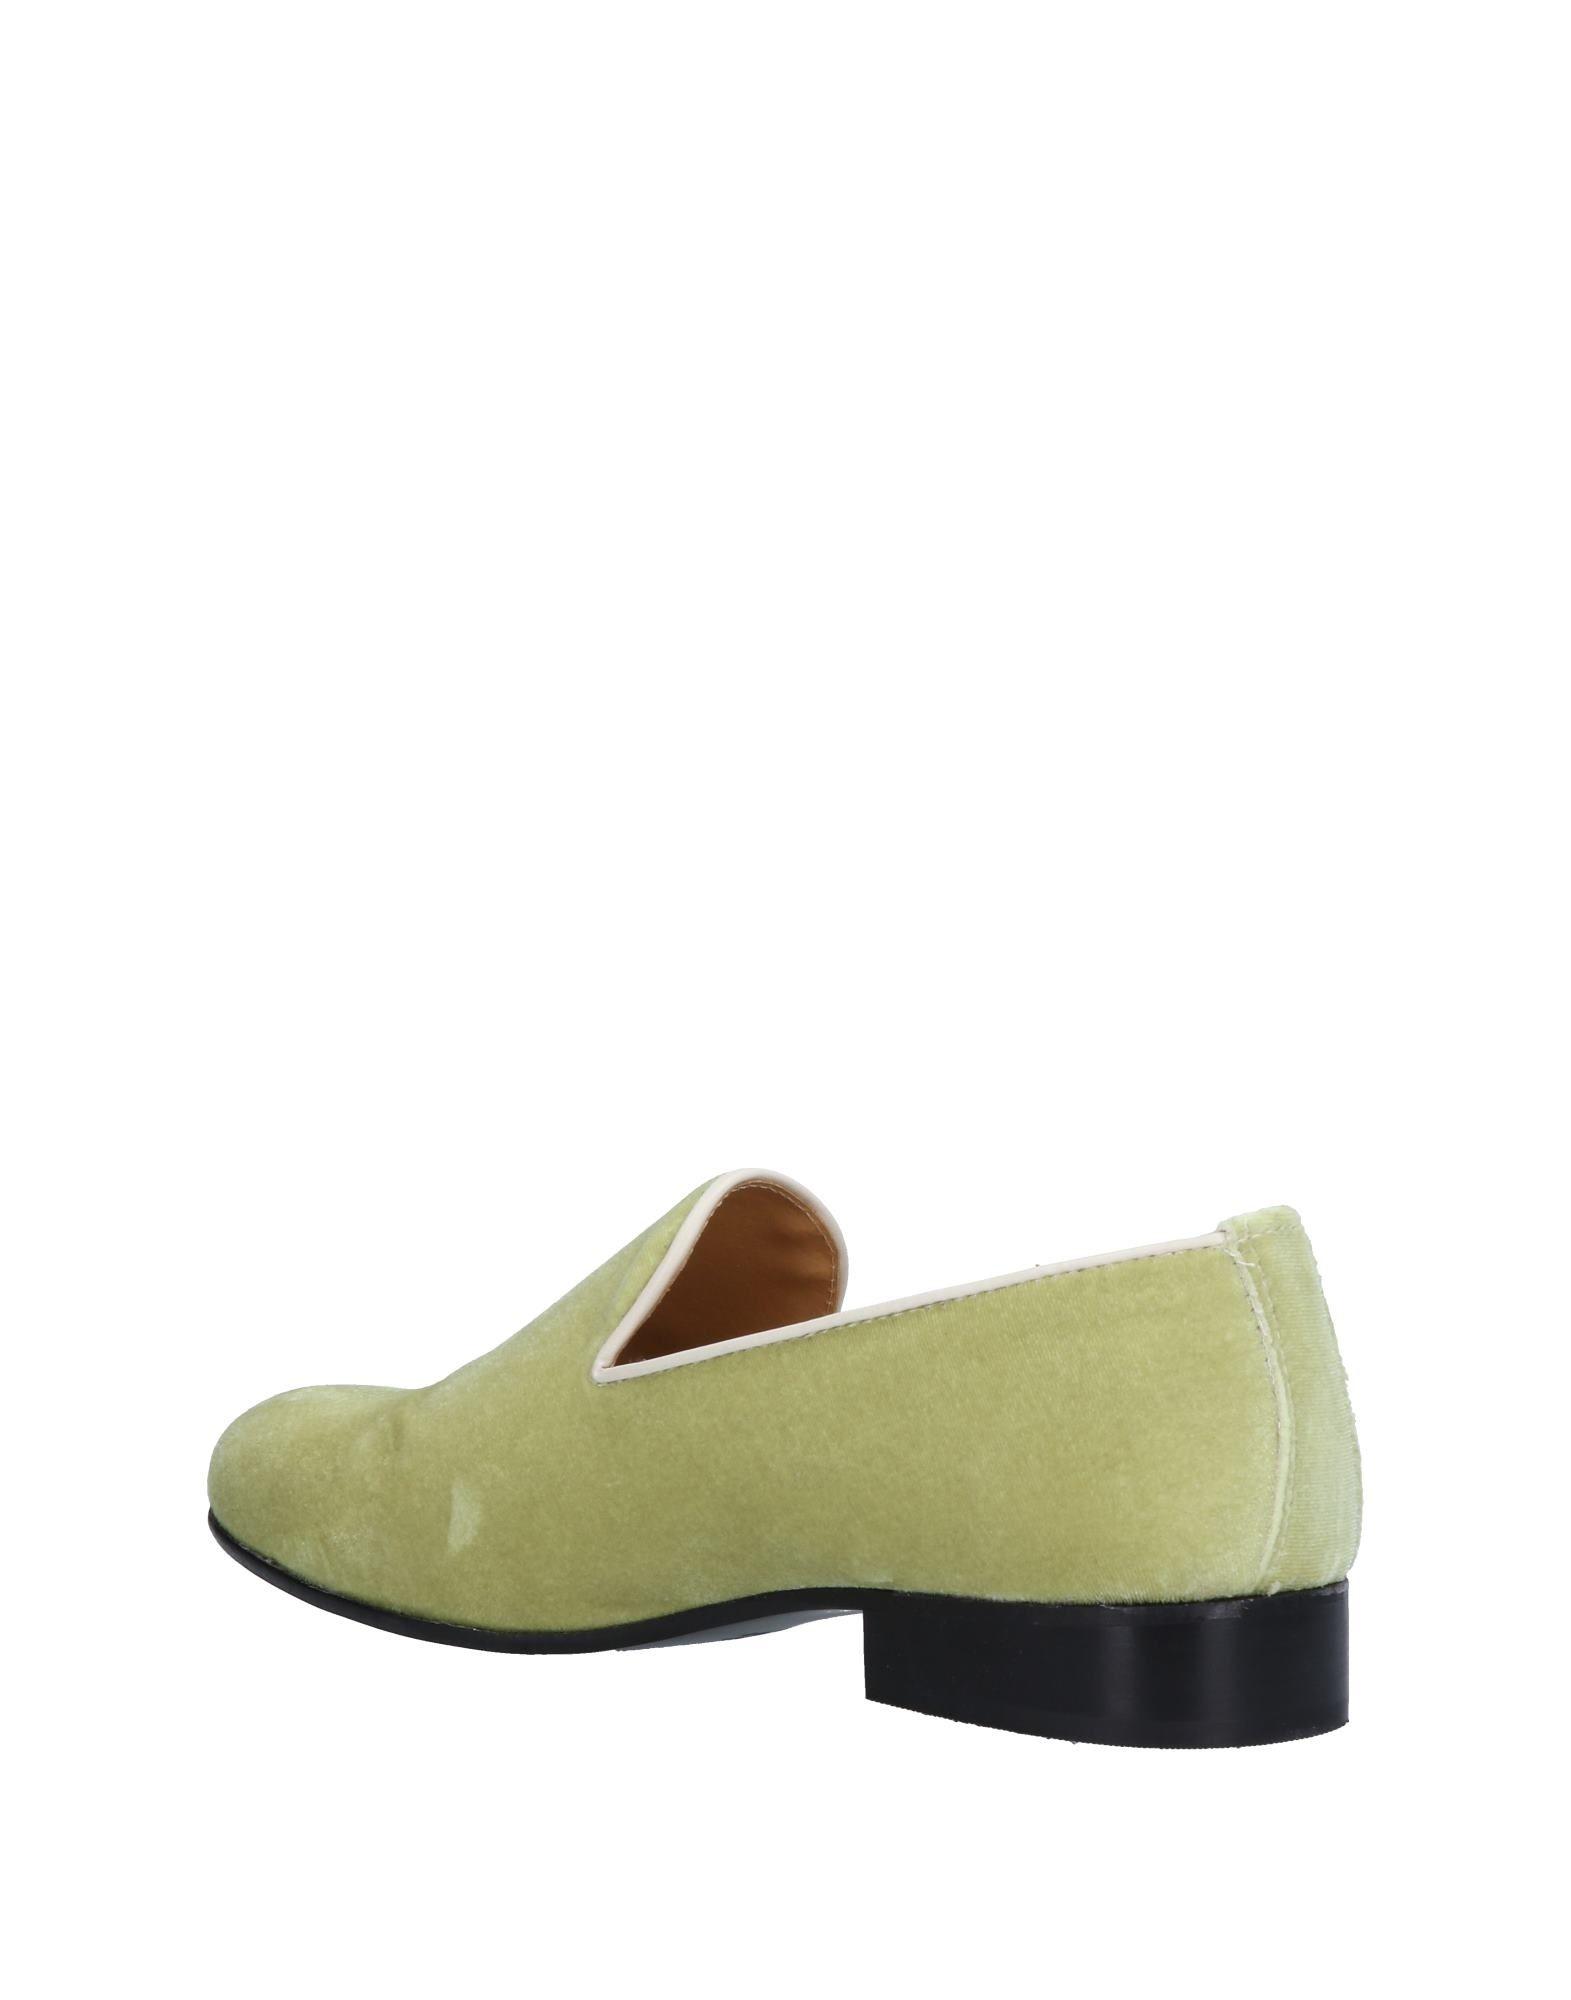 Alberto Moretti Gute Mokassins Herren  11508969BN Gute Moretti Qualität beliebte Schuhe 4e69b3